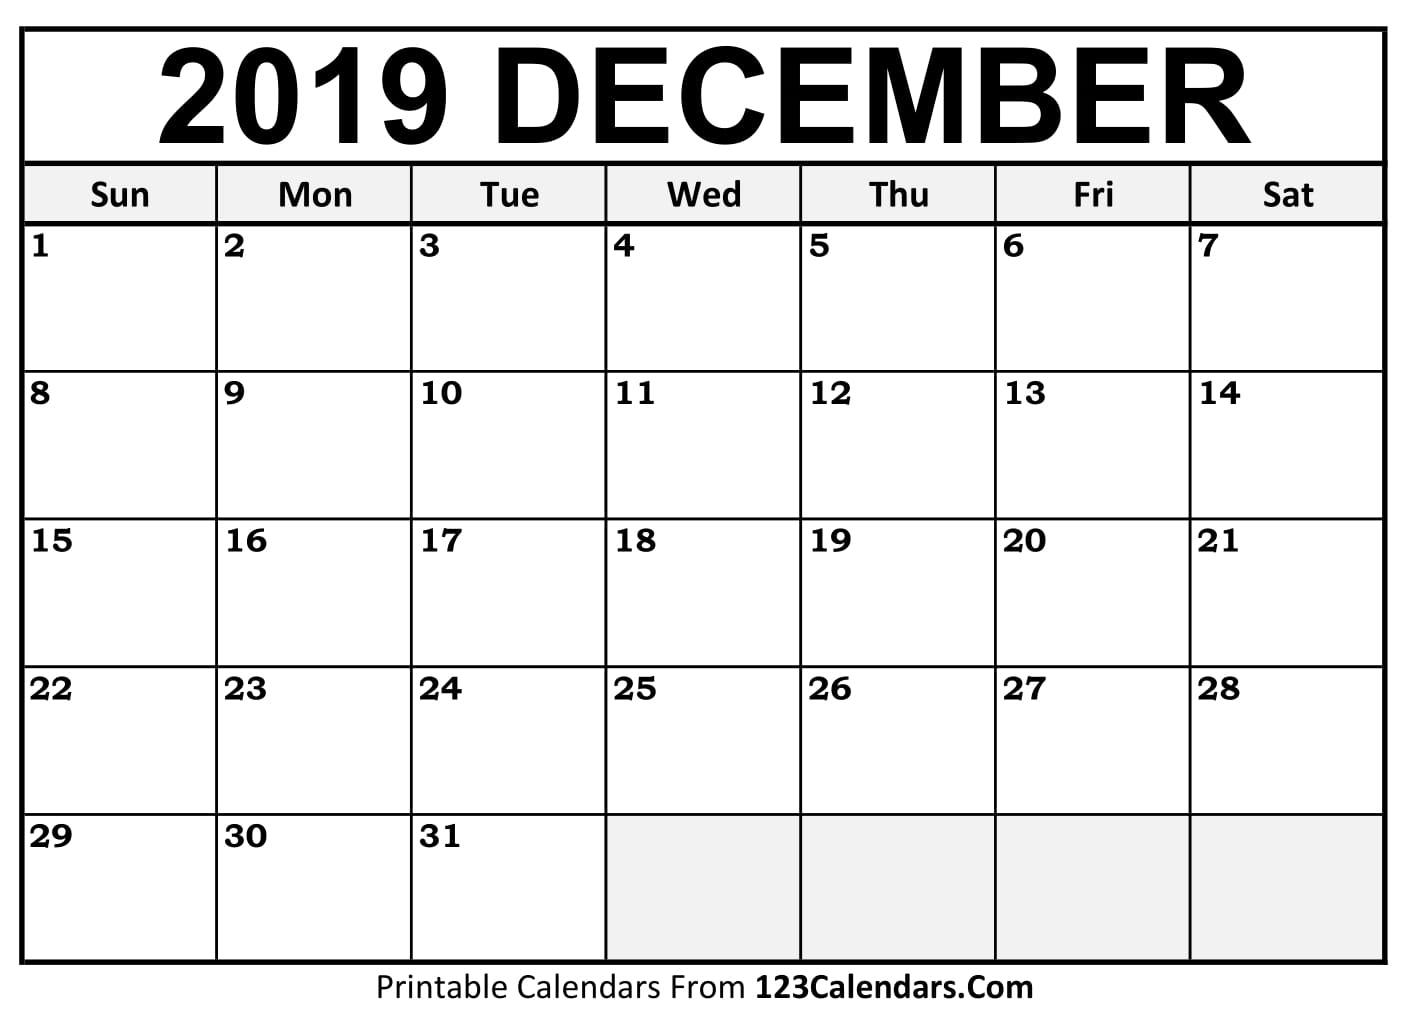 December 2018 Calendar Free Download